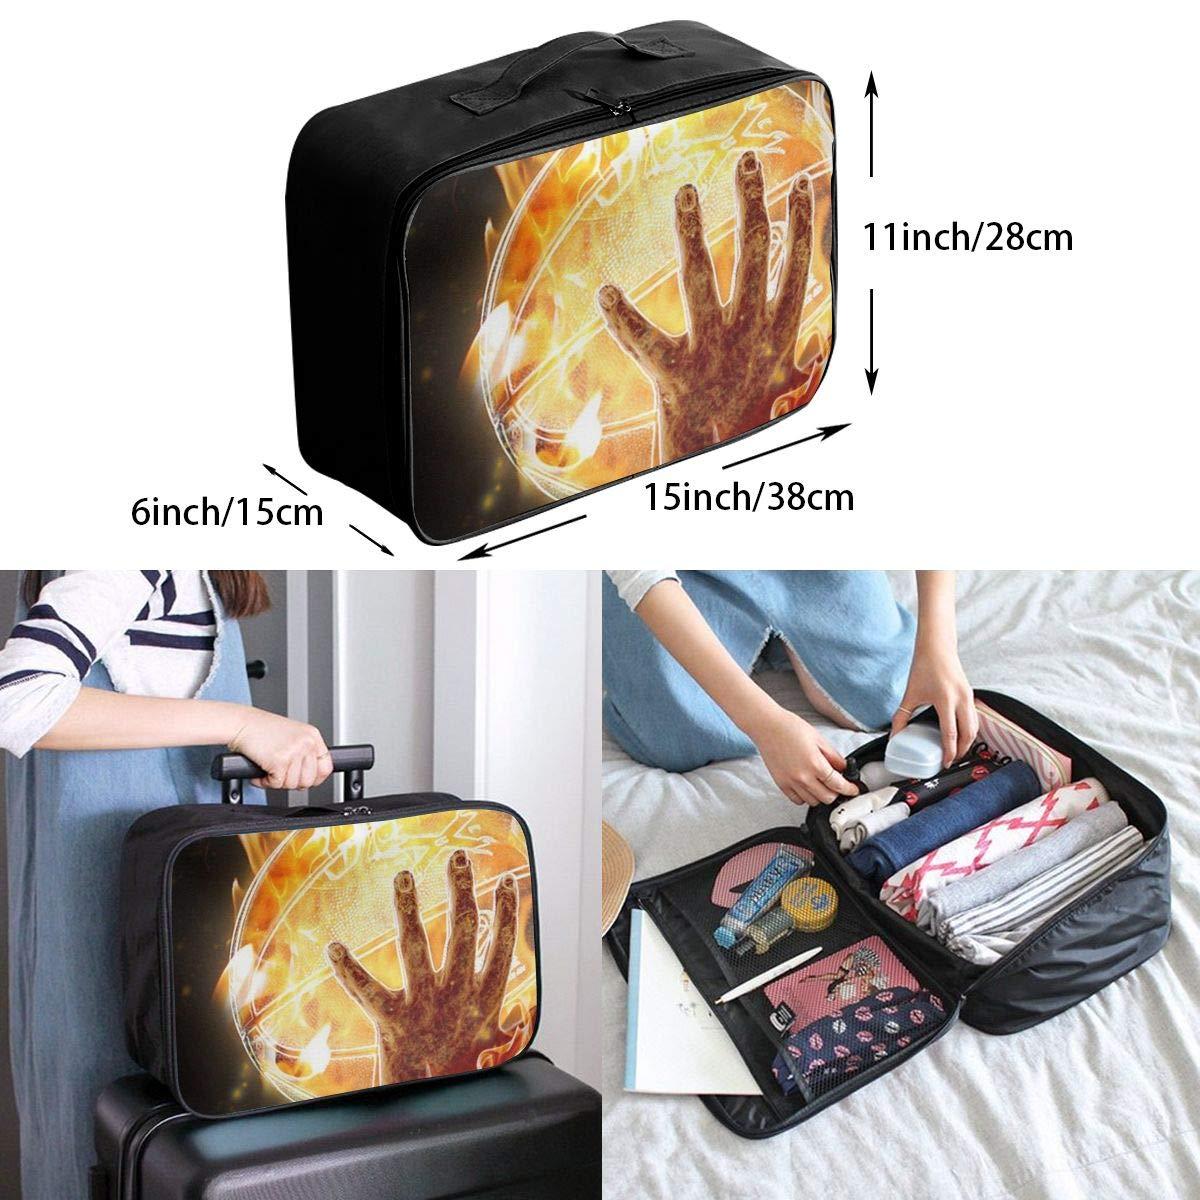 Travel Luggage Duffle Bag Lightweight Portable Handbag Fire Hands Balls Print Large Capacity Waterproof Foldable Storage Tote